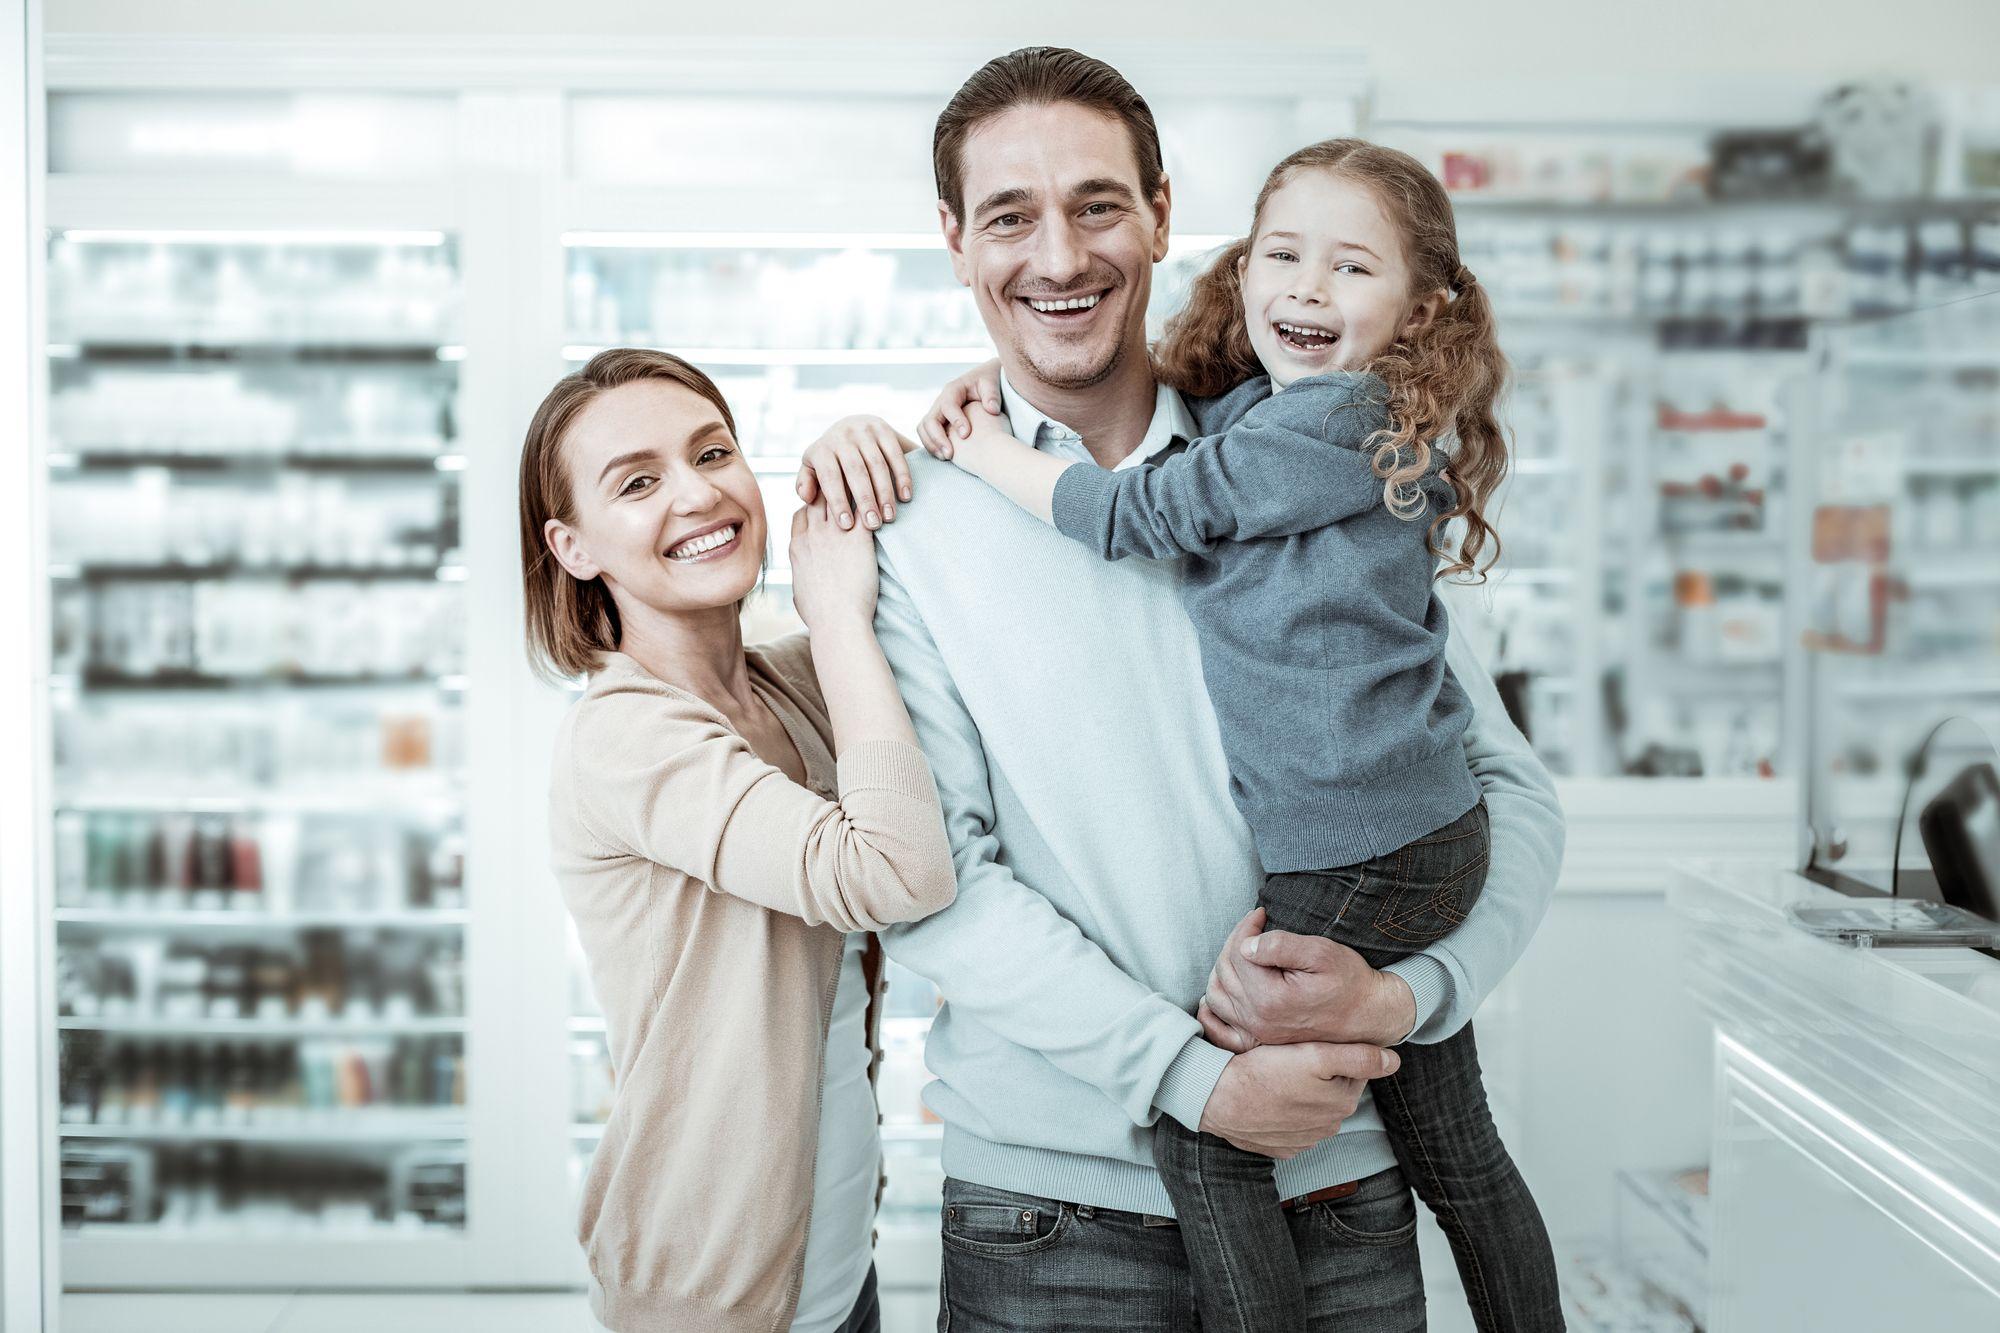 Family cuddles in pharmacy